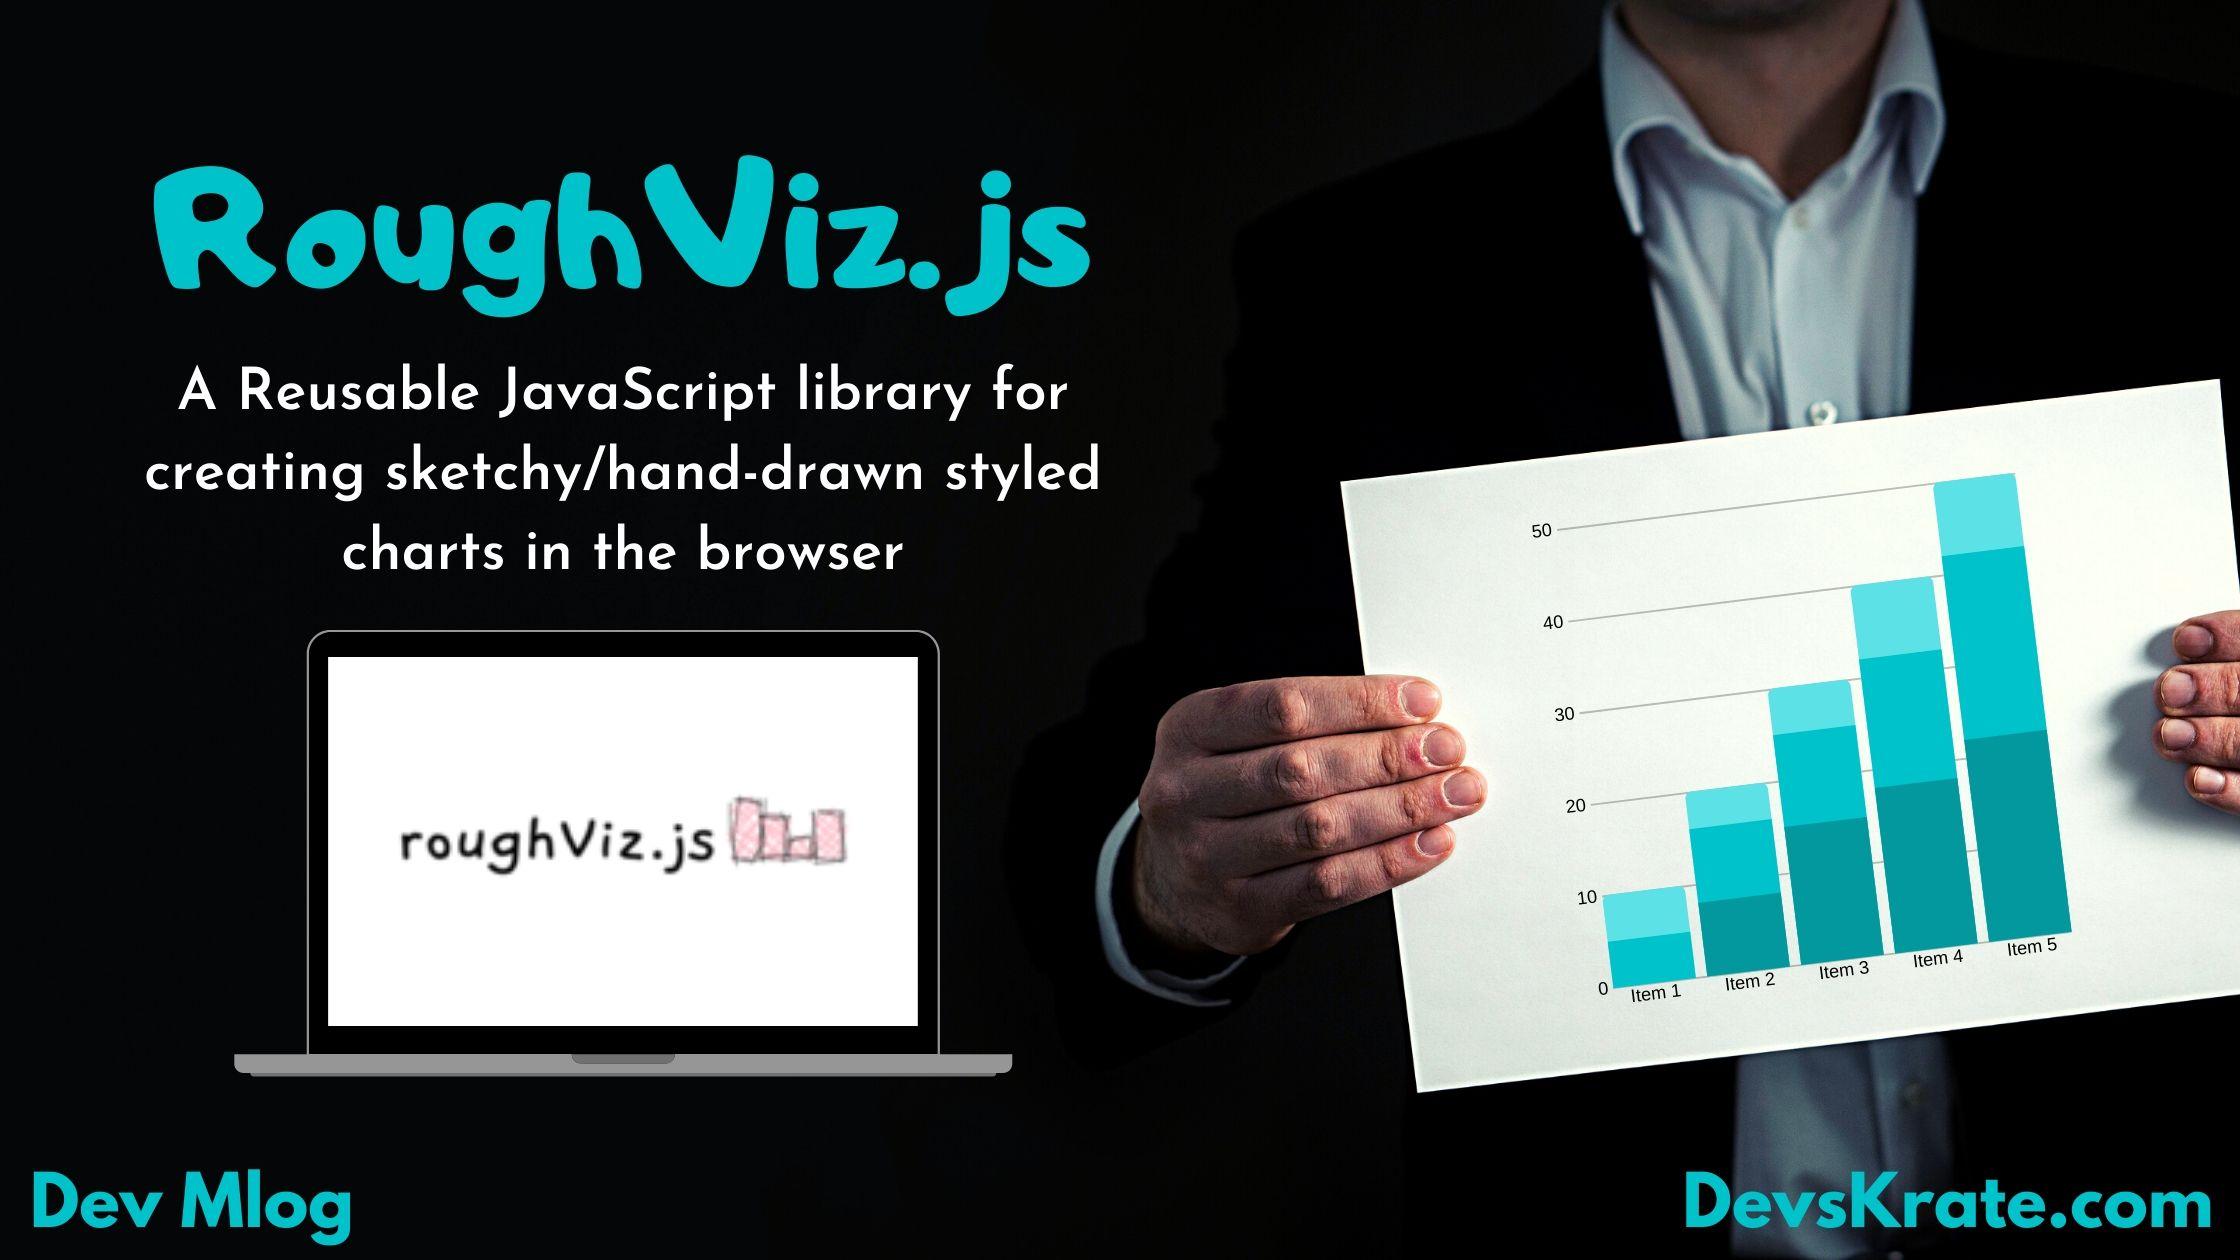 RoughViz.js - for creating sketchy/hand-drawn styled charts